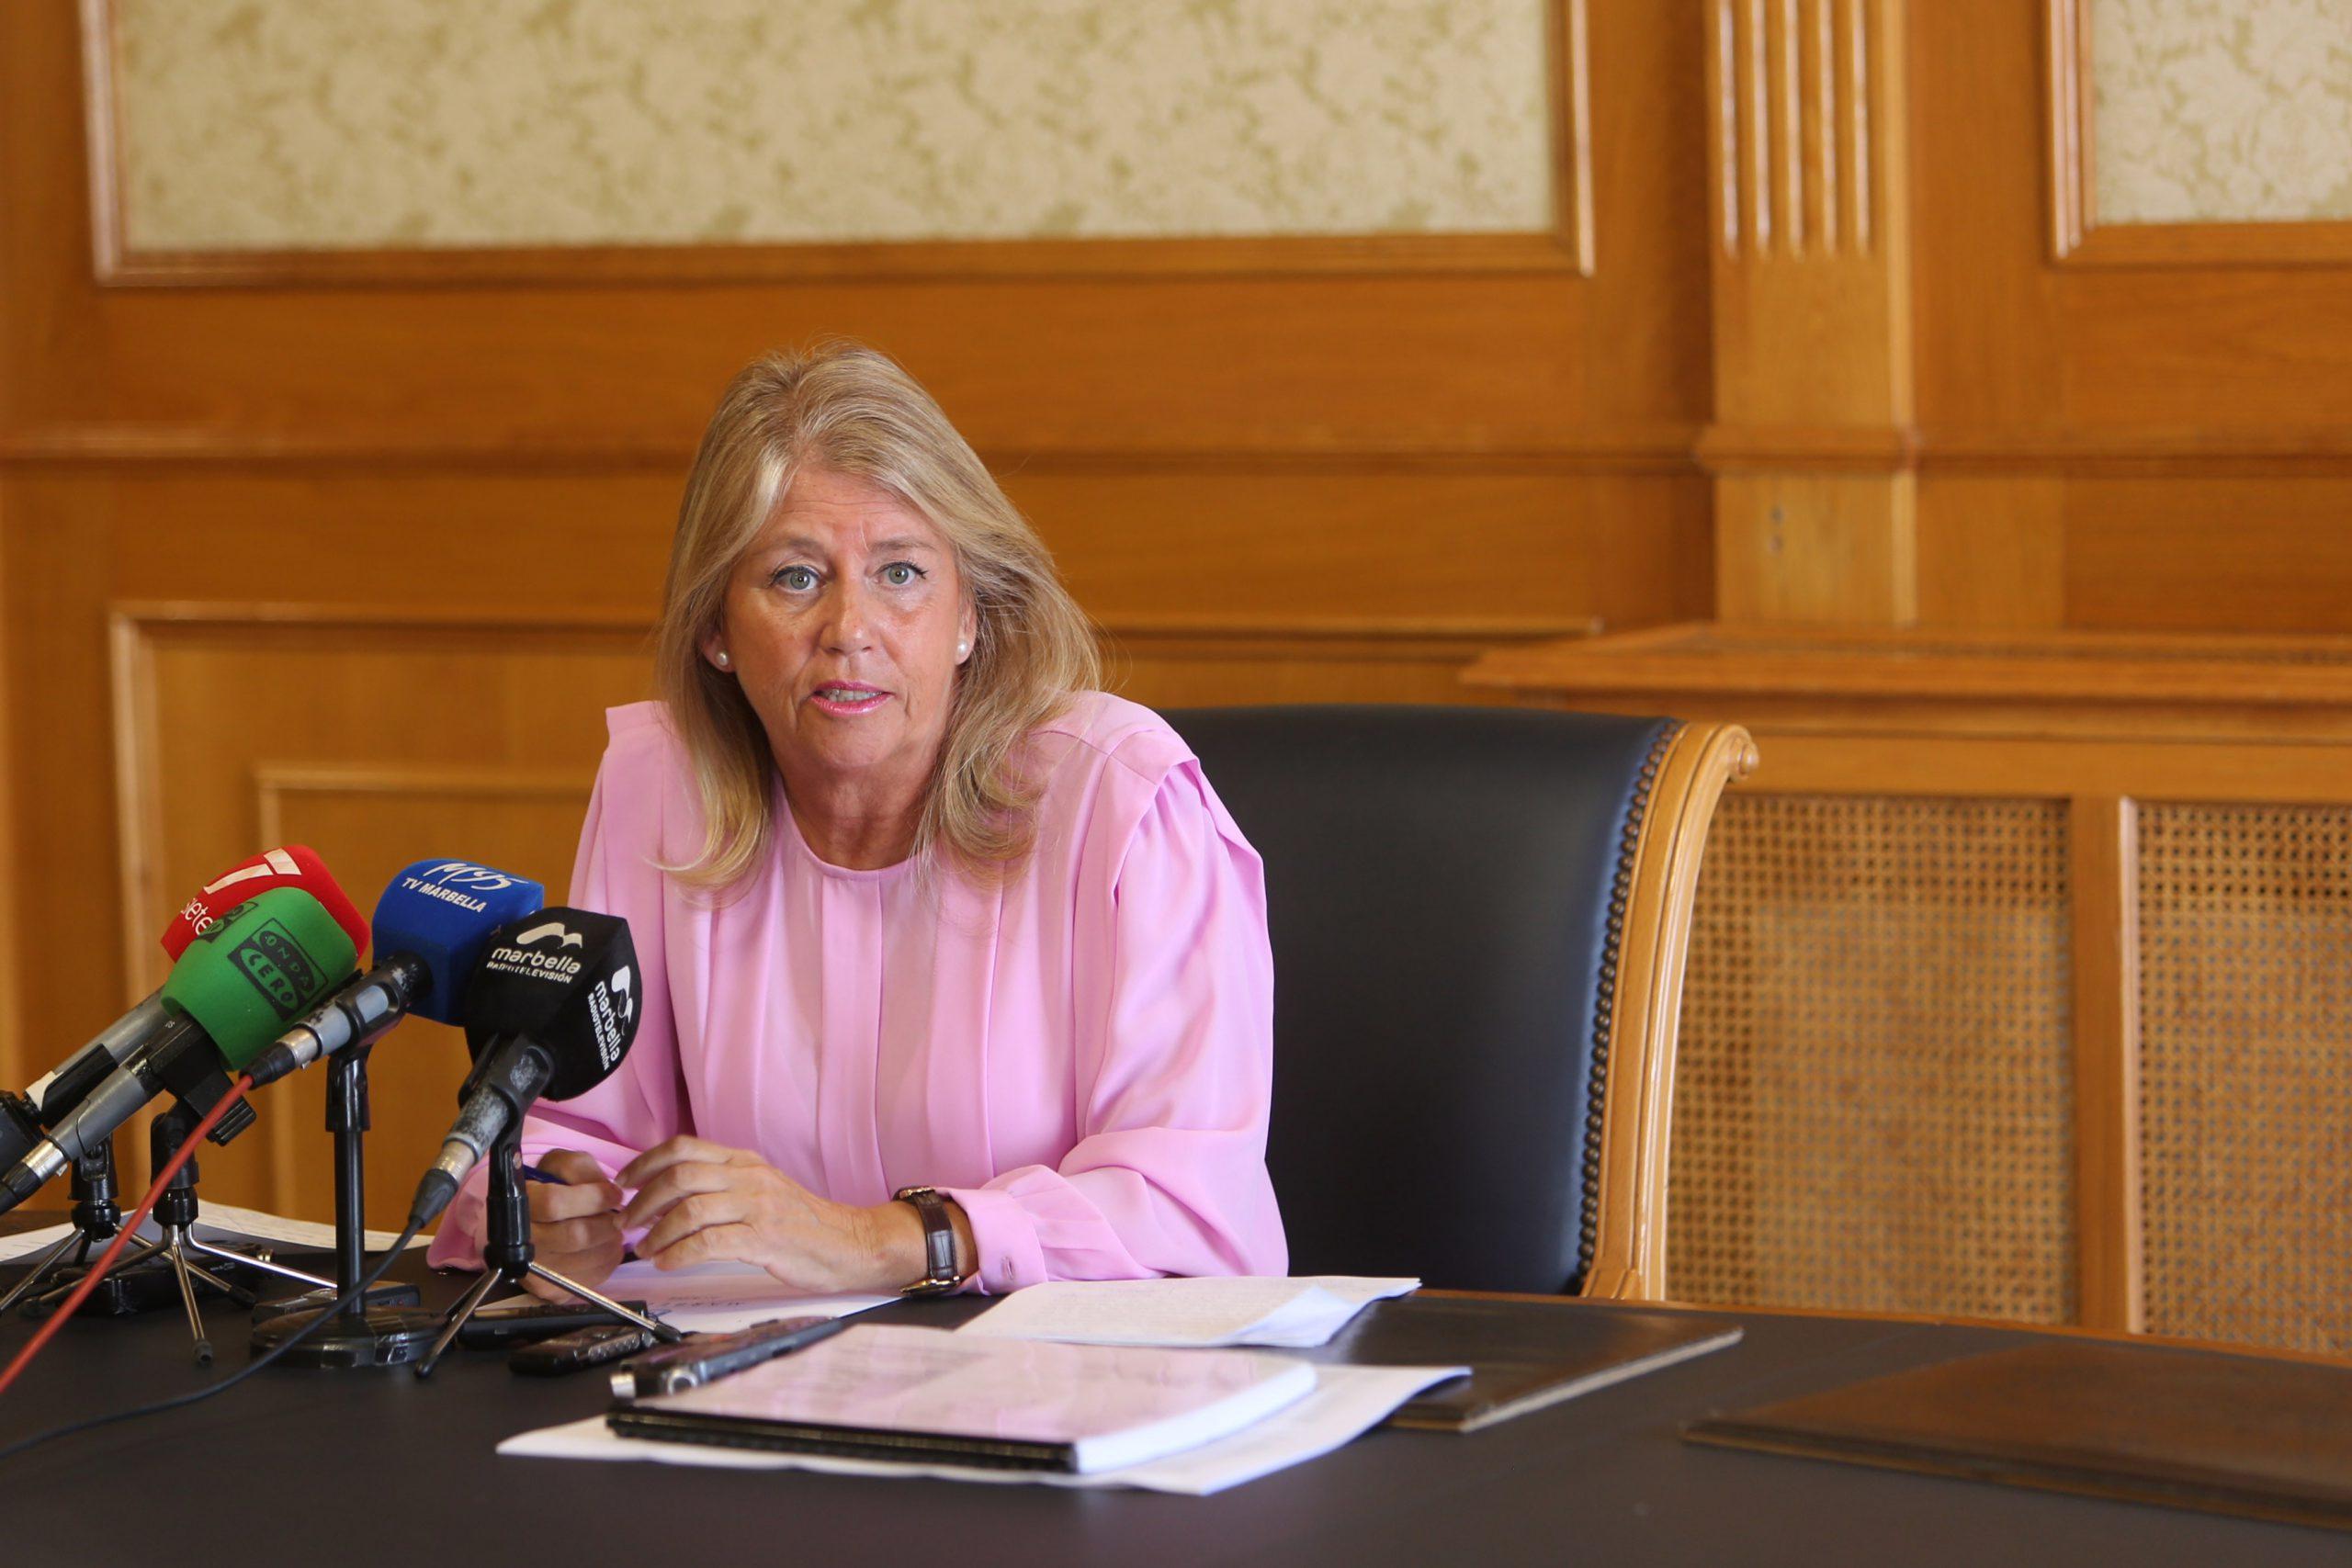 La alcaldesa de Marbella destaca el